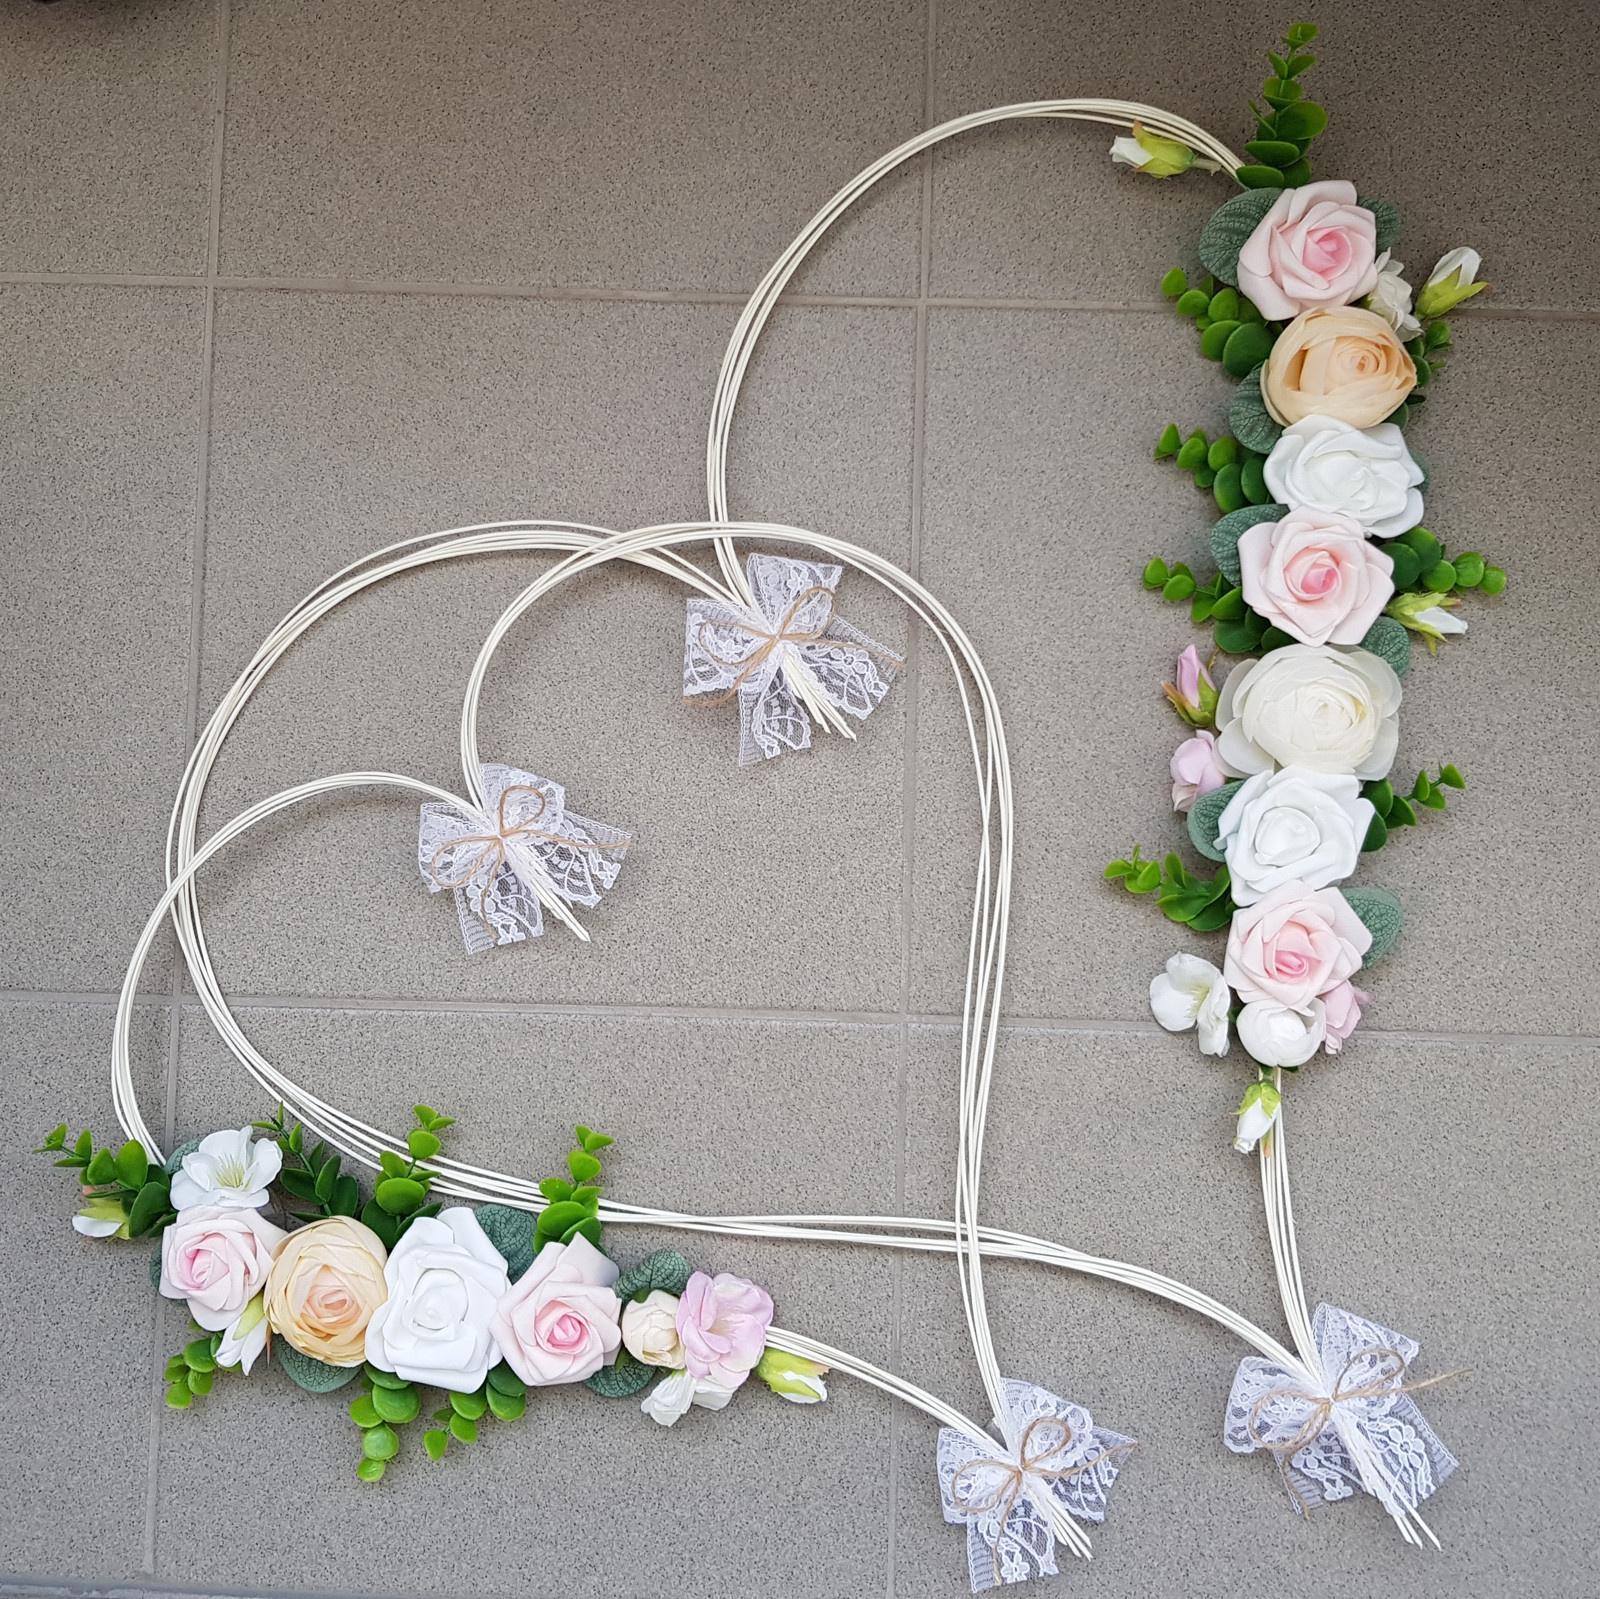 Srdce na kapotu bílá, růžová a šampaň  - Obrázek č. 1